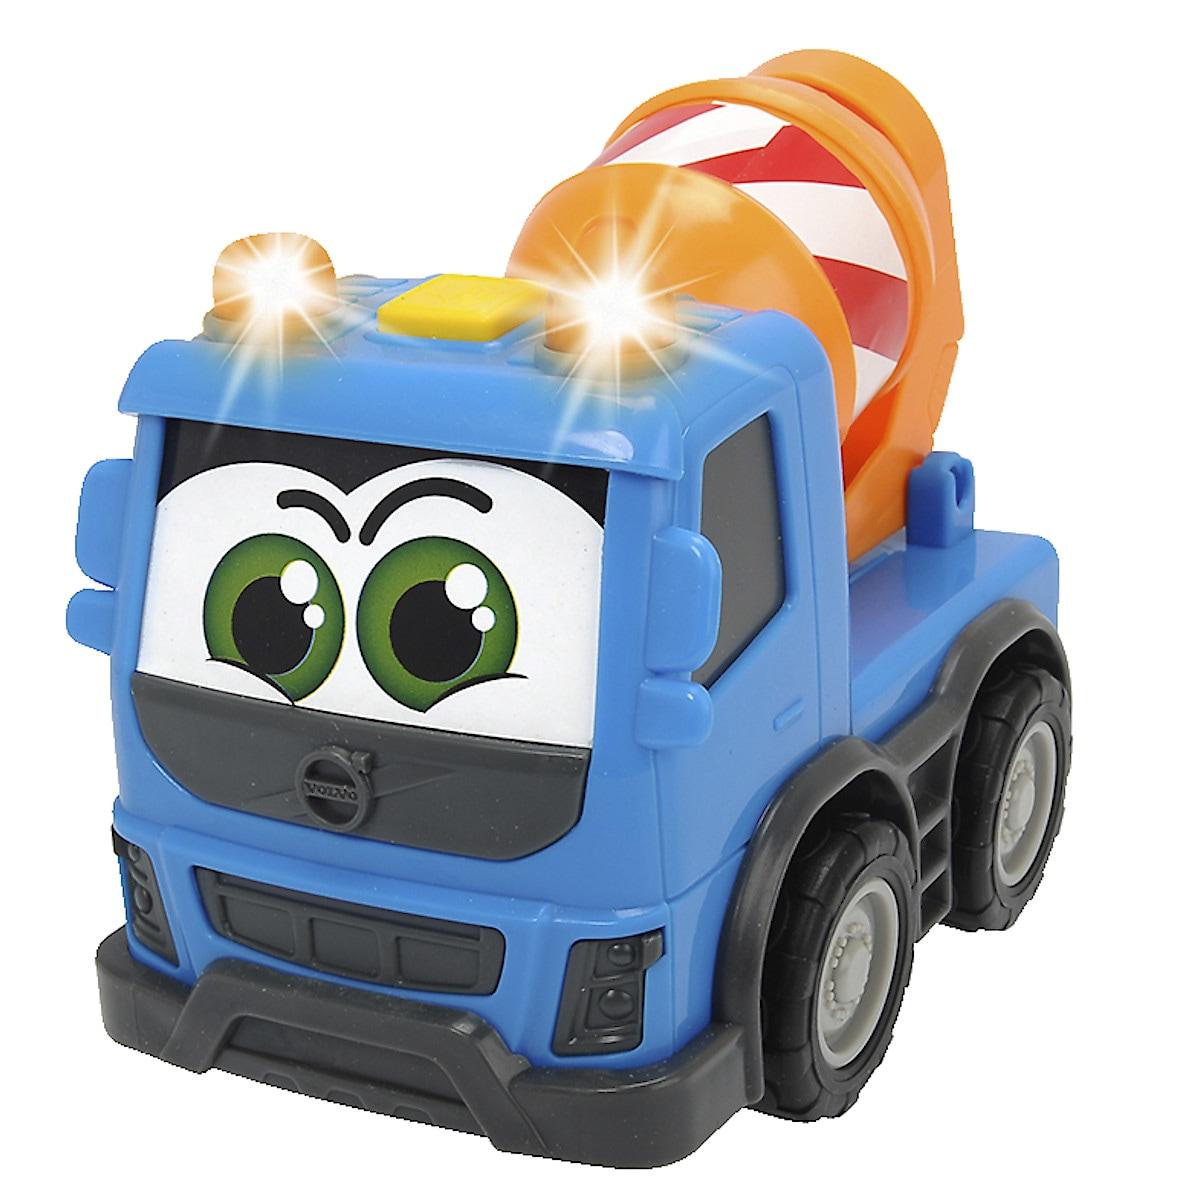 Happy Volvo FMX Työajoneuvo pienille lapsille